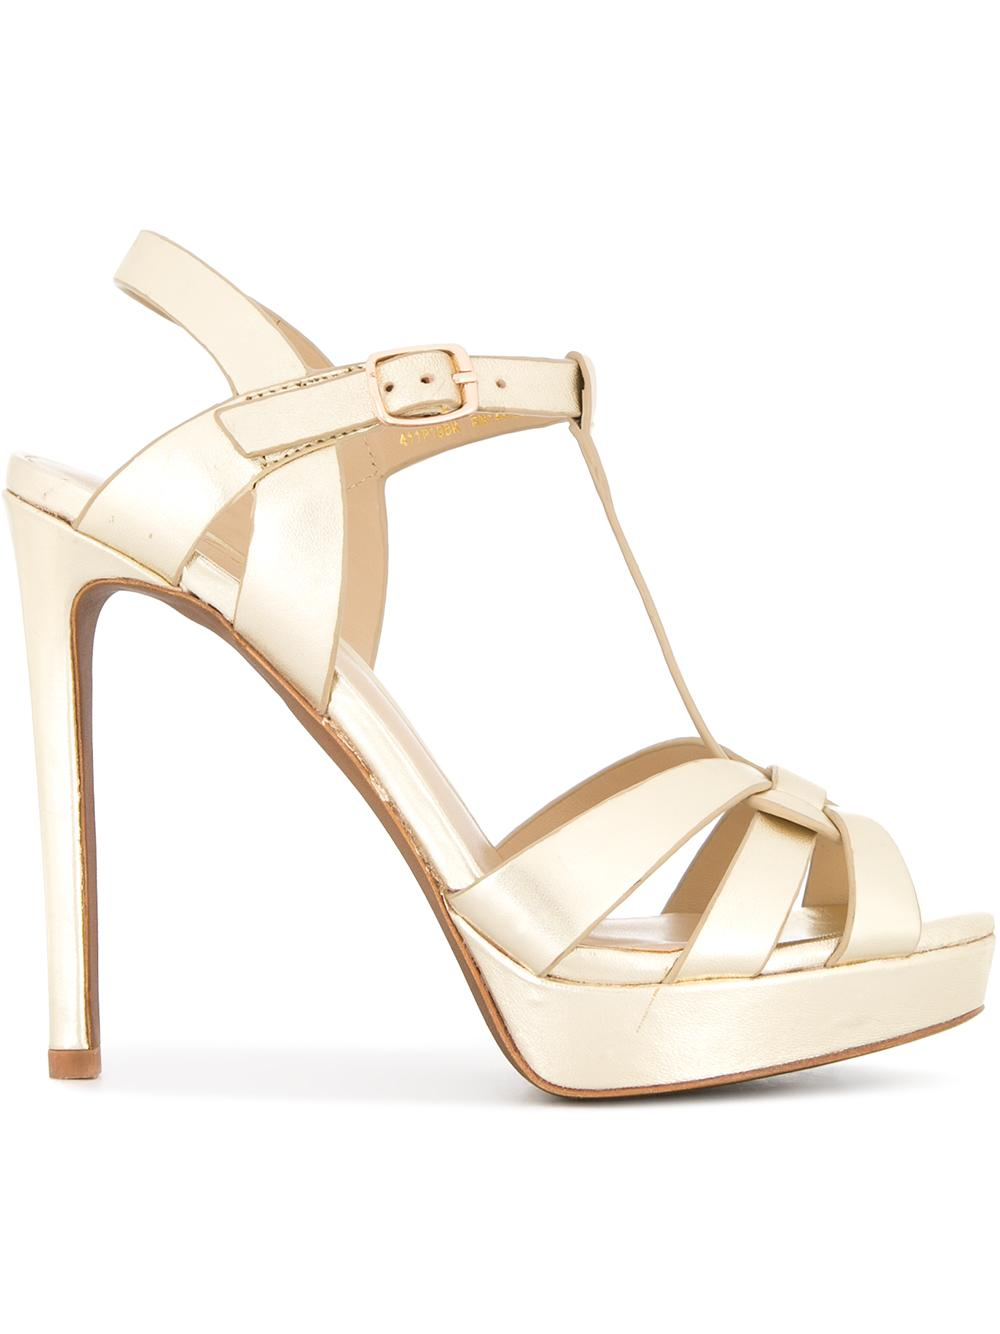 Gold Tone Platform Stiletto Sandal Item # 411P19BK